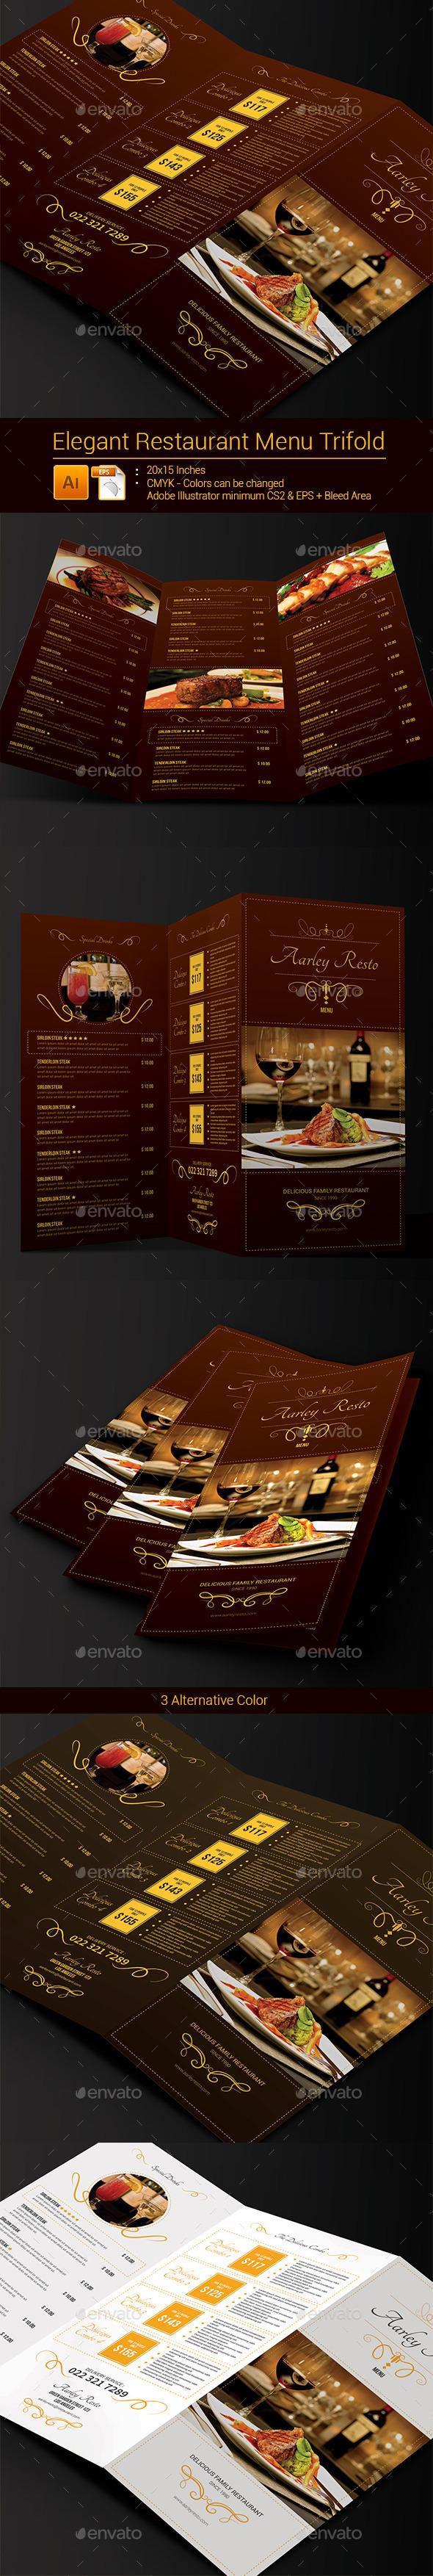 GraphicRiver Elegant Restaurant Menu Trifold 9137918